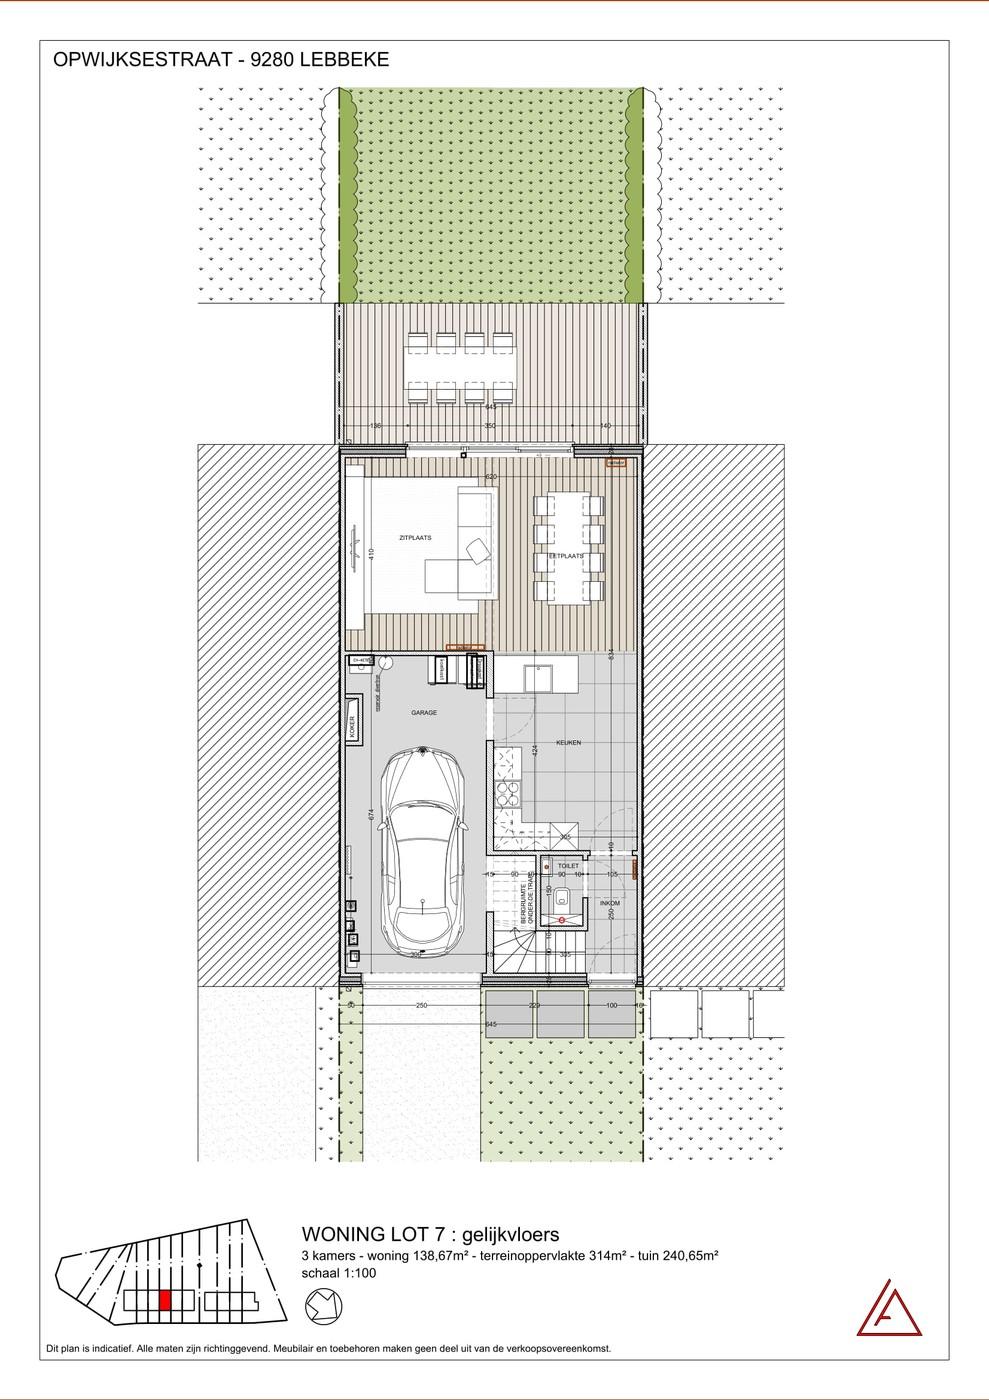 Investering nieuwbouw 3 slaapkamer woning met garage en tuin te Lebbeke!